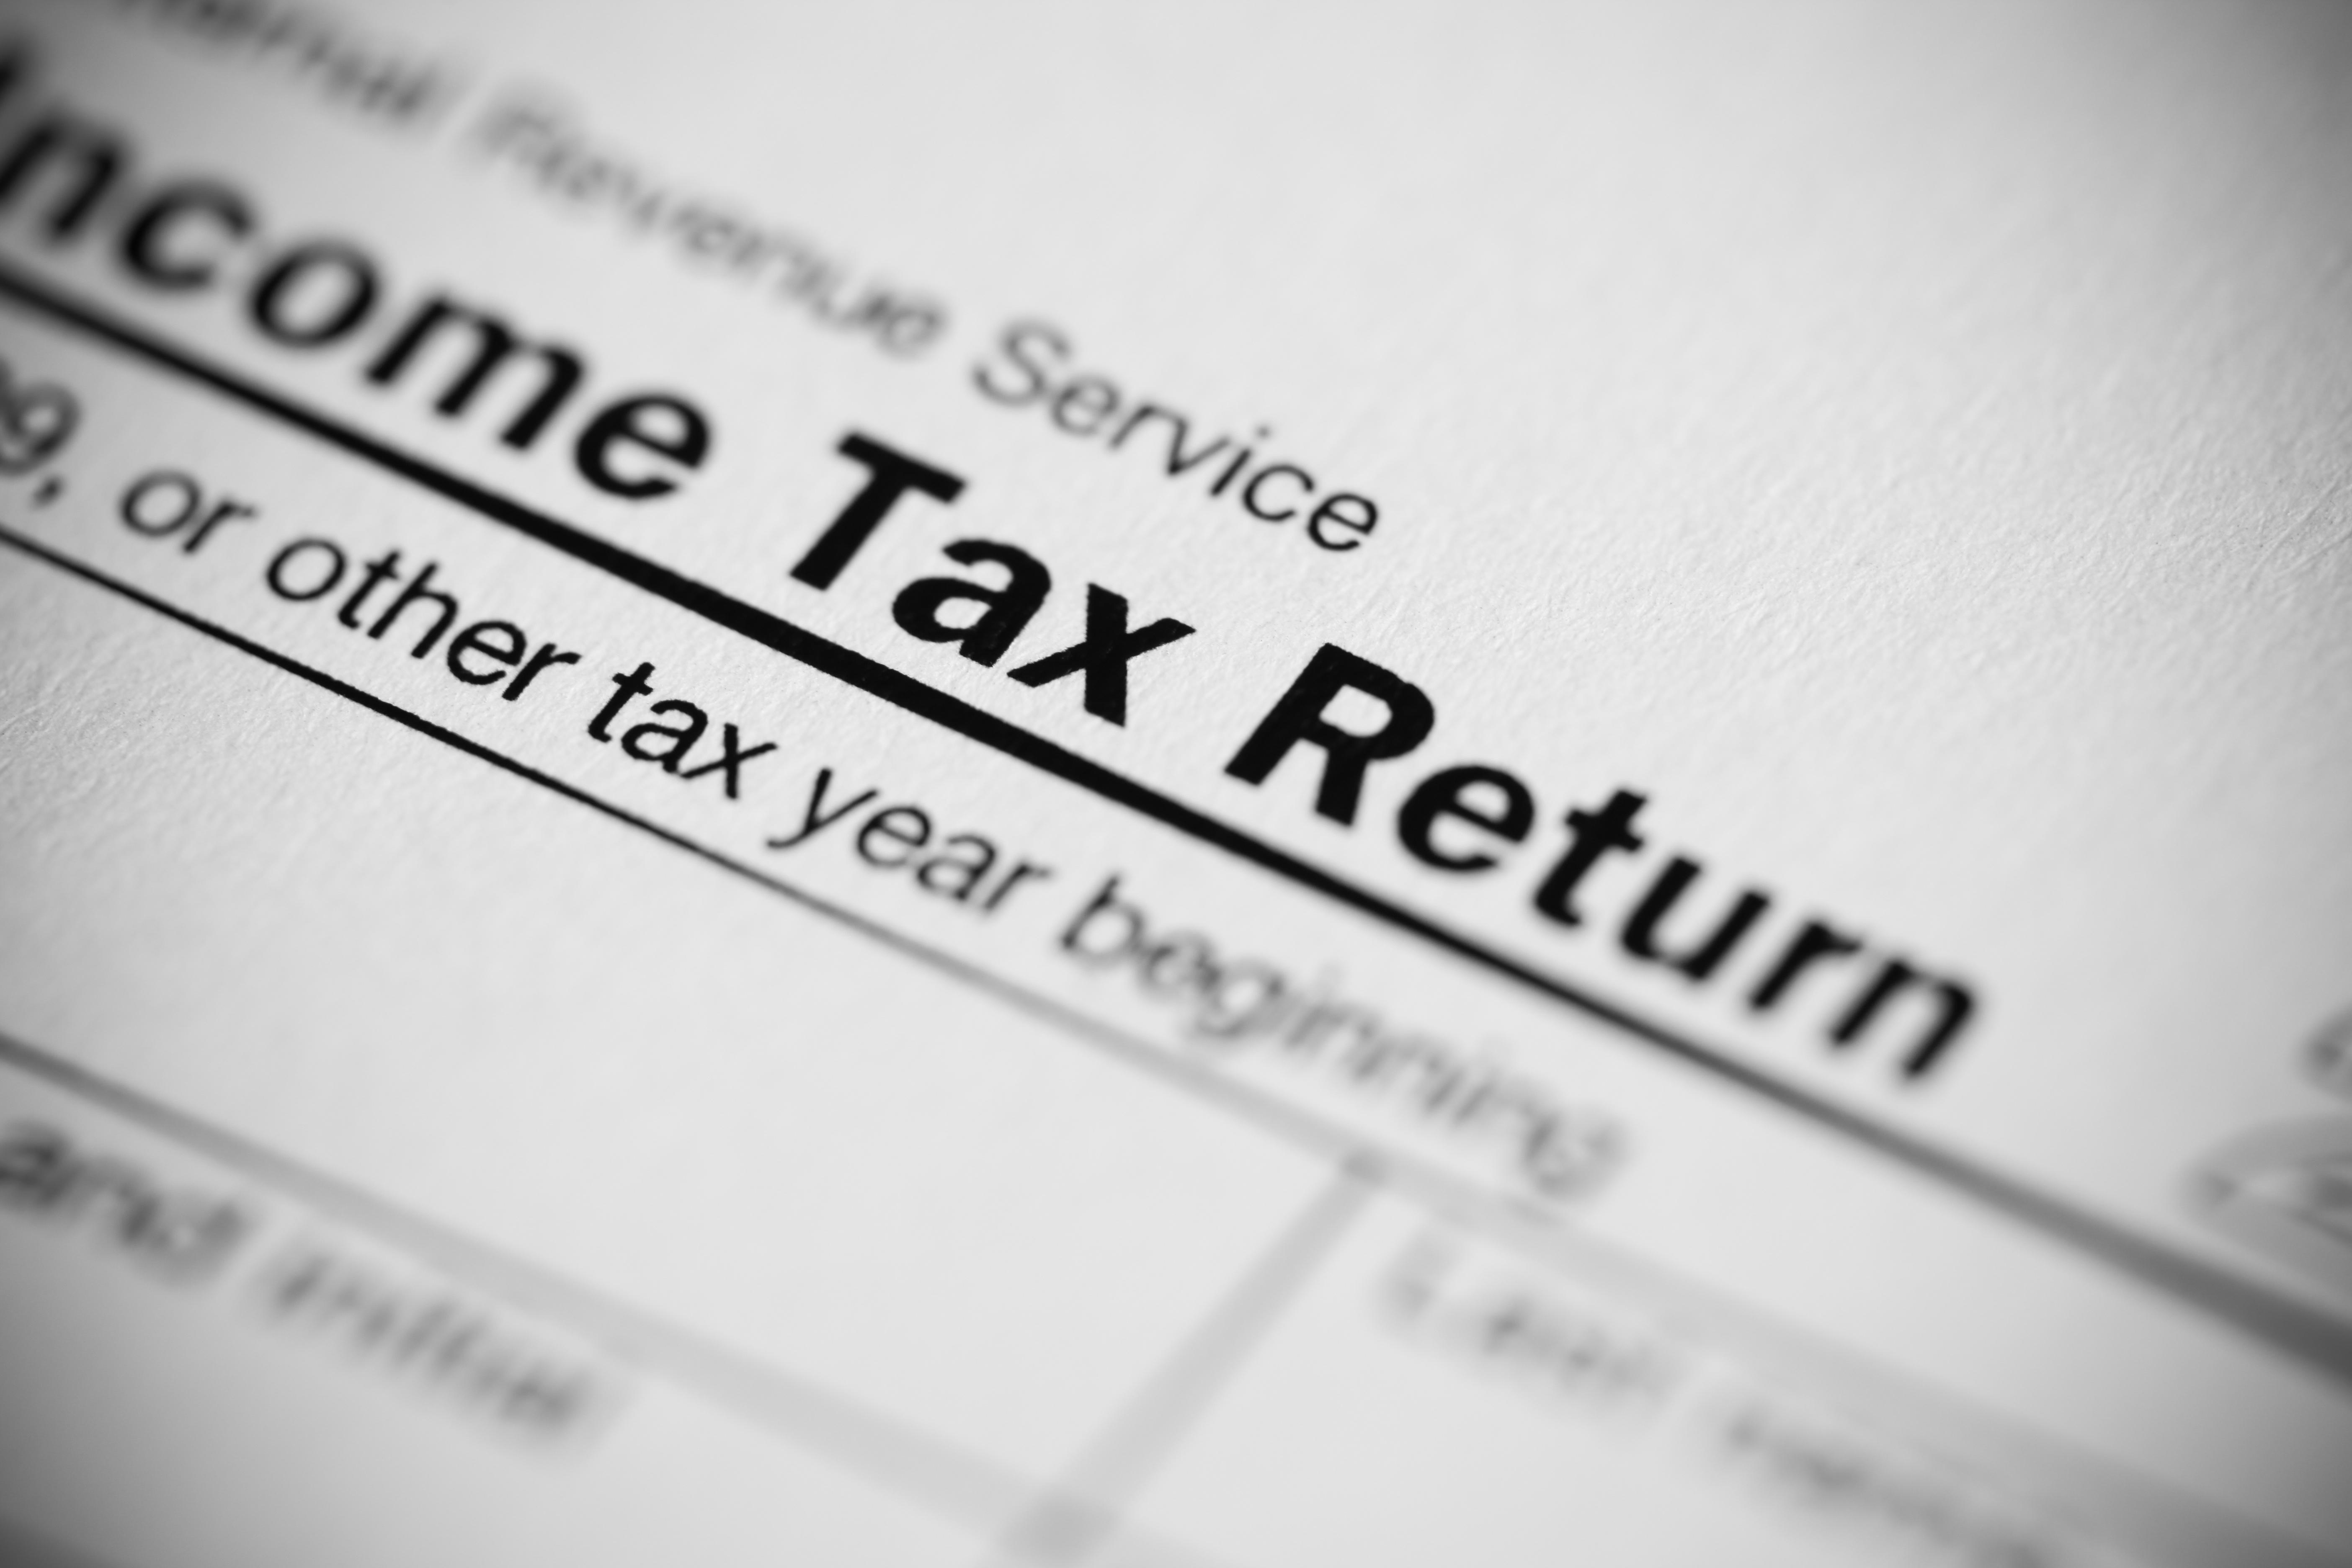 Tax Return Form close-up concept